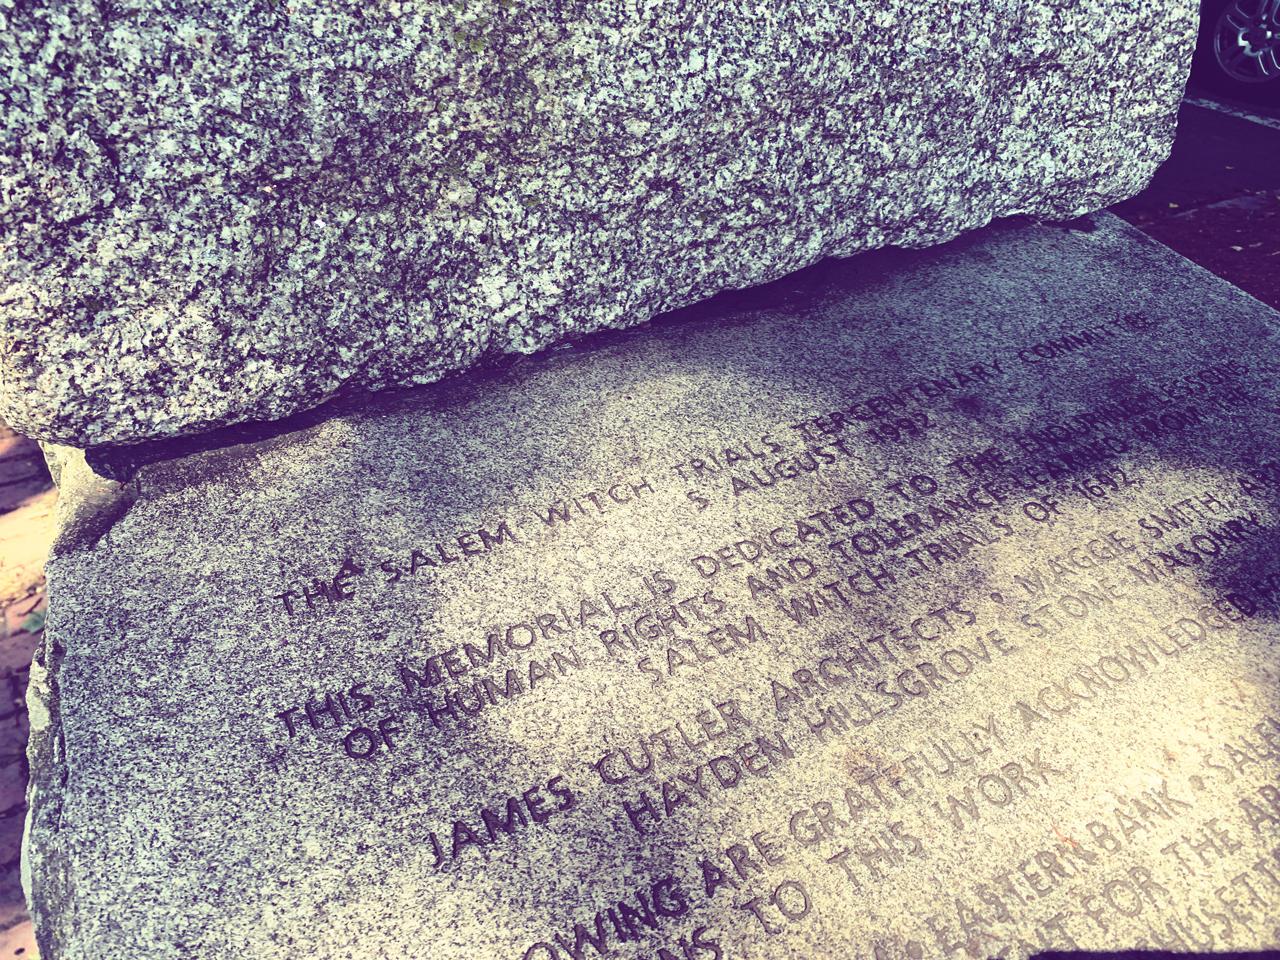 salem-witch-trials-memorial-massachusetts-1280x960-02